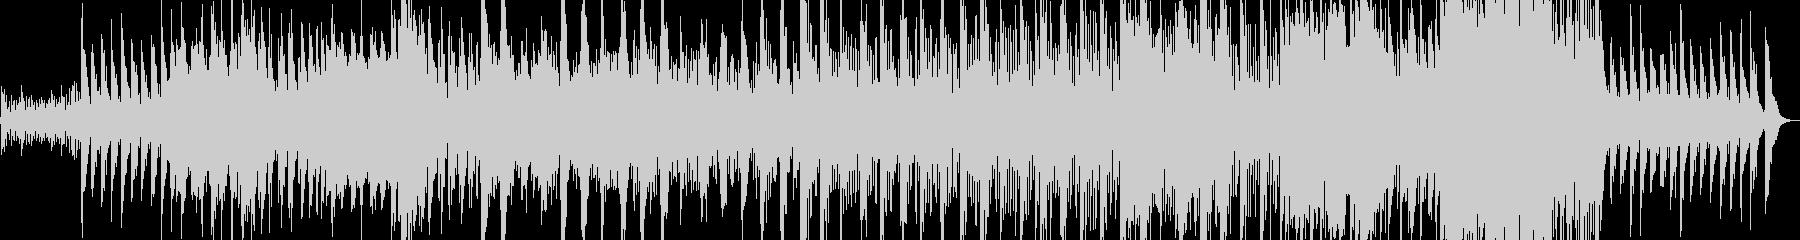 Chamber orchestraの未再生の波形